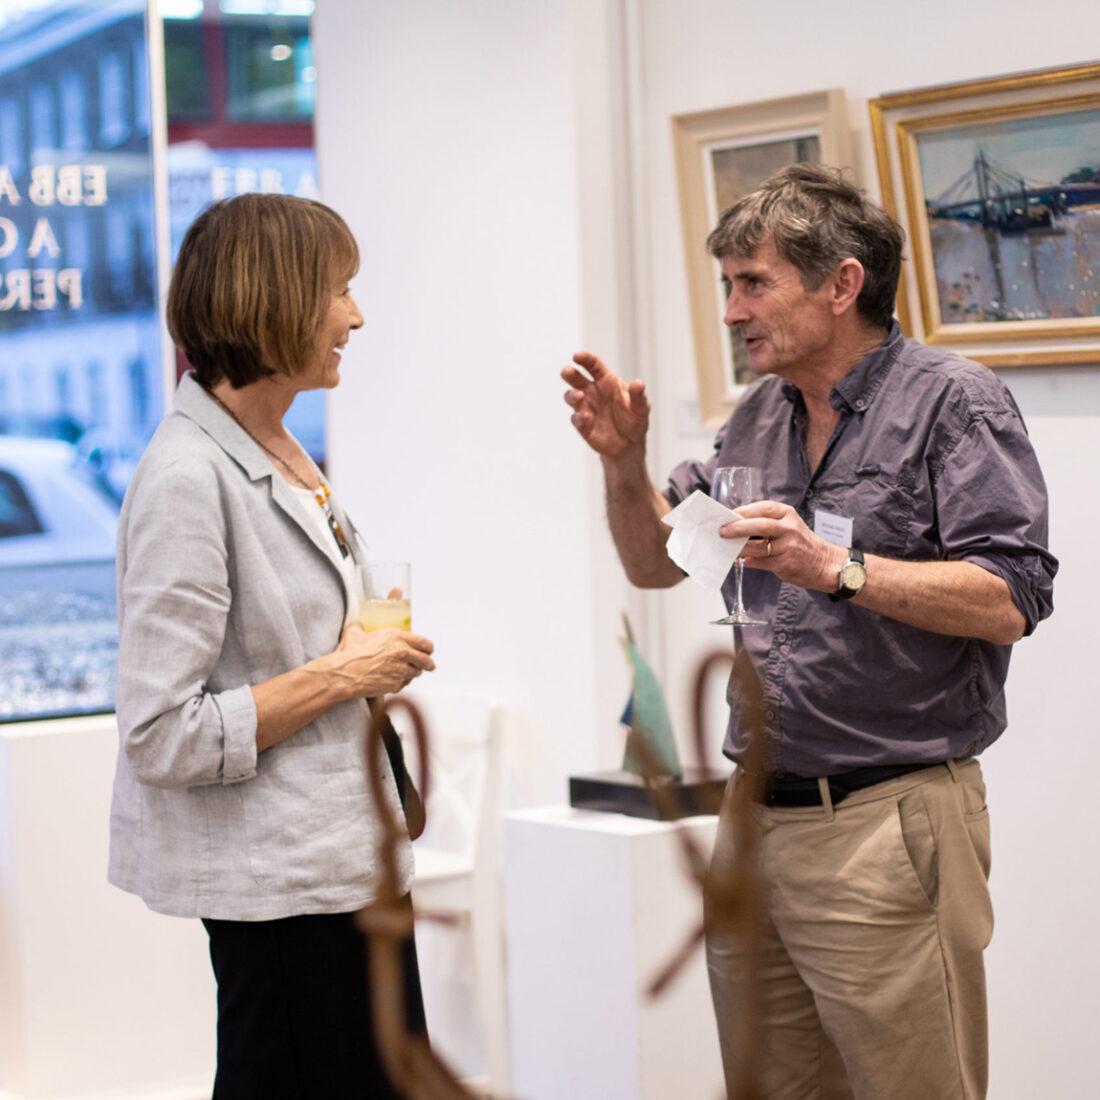 Man and woman talking inside art gallery